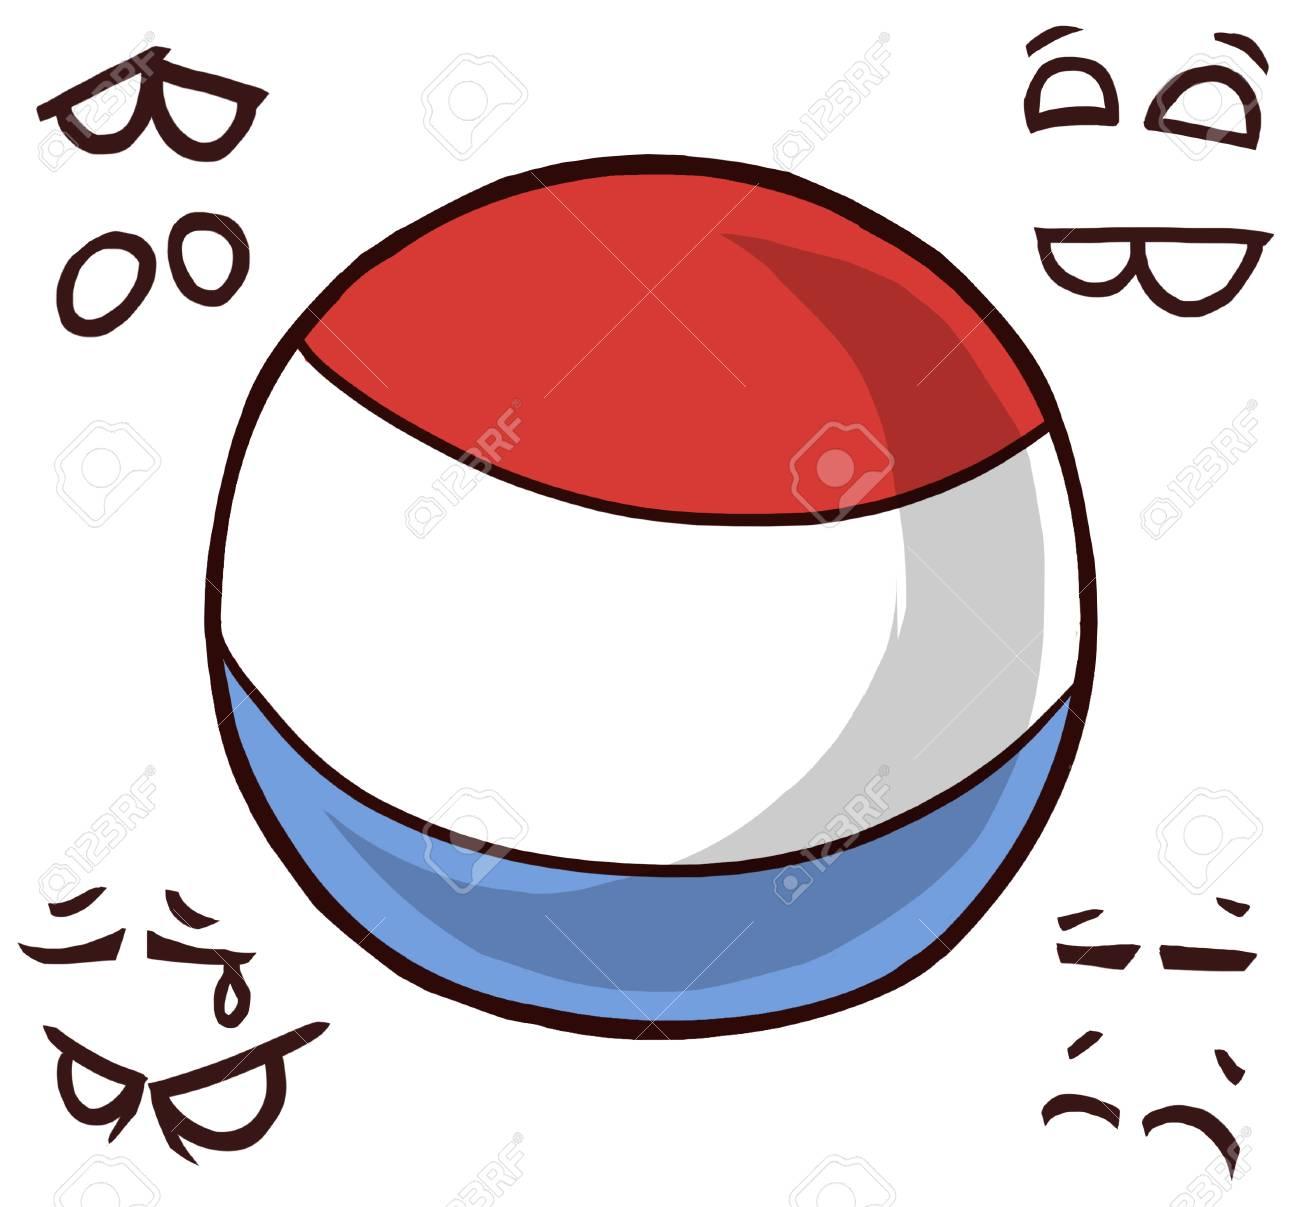 Luxemburg country ball - 110723154